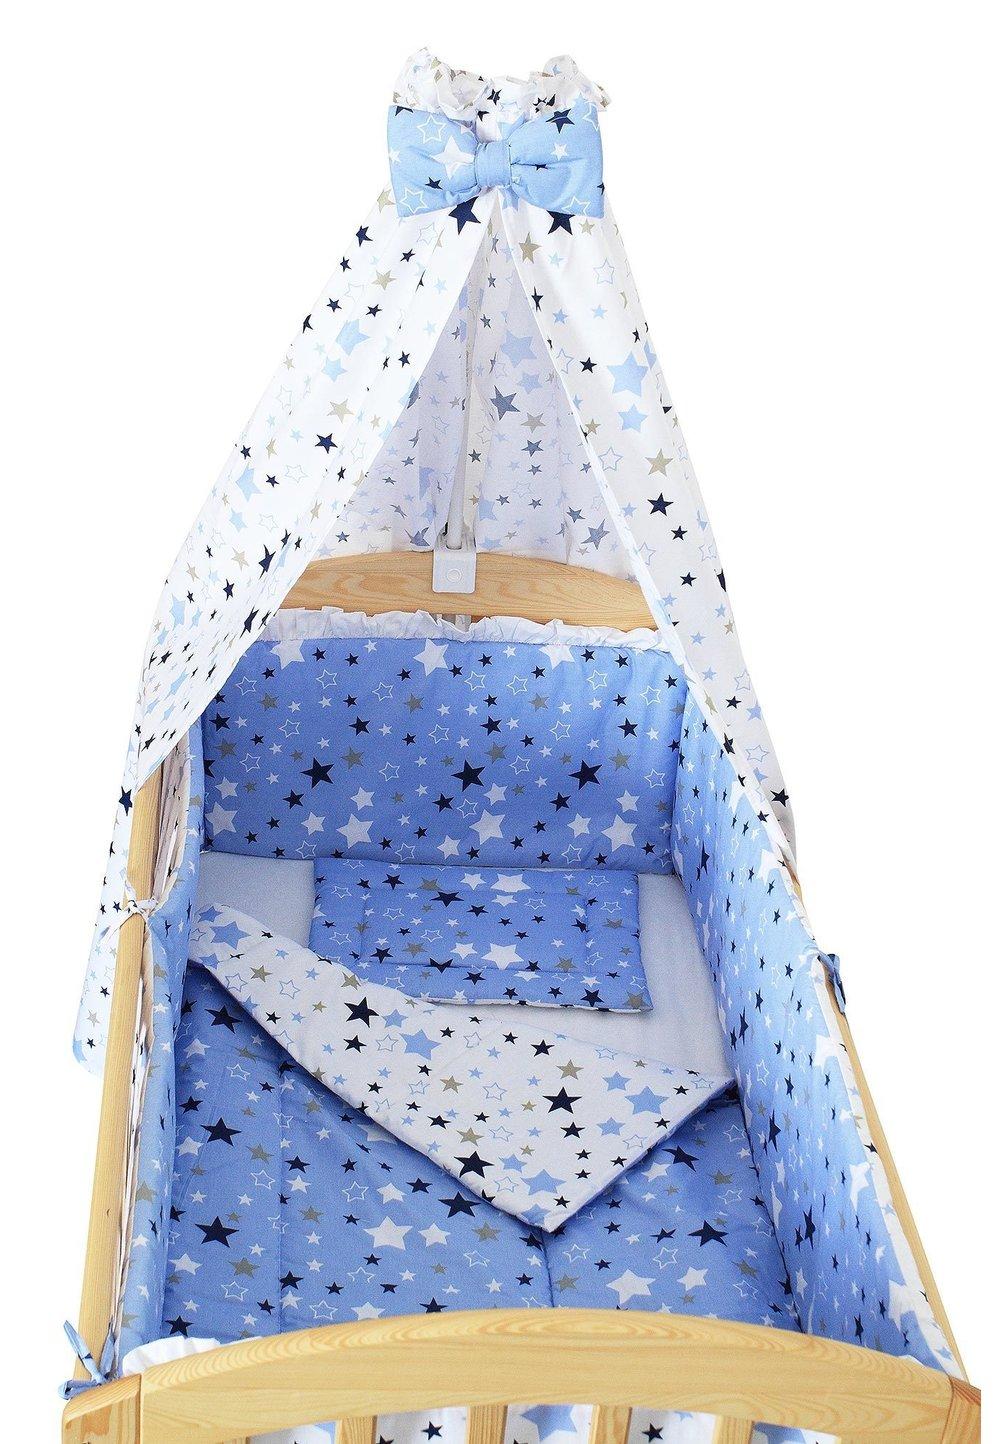 Baldachin patut, stelutele, albastre , 200 x 150 cm imagine